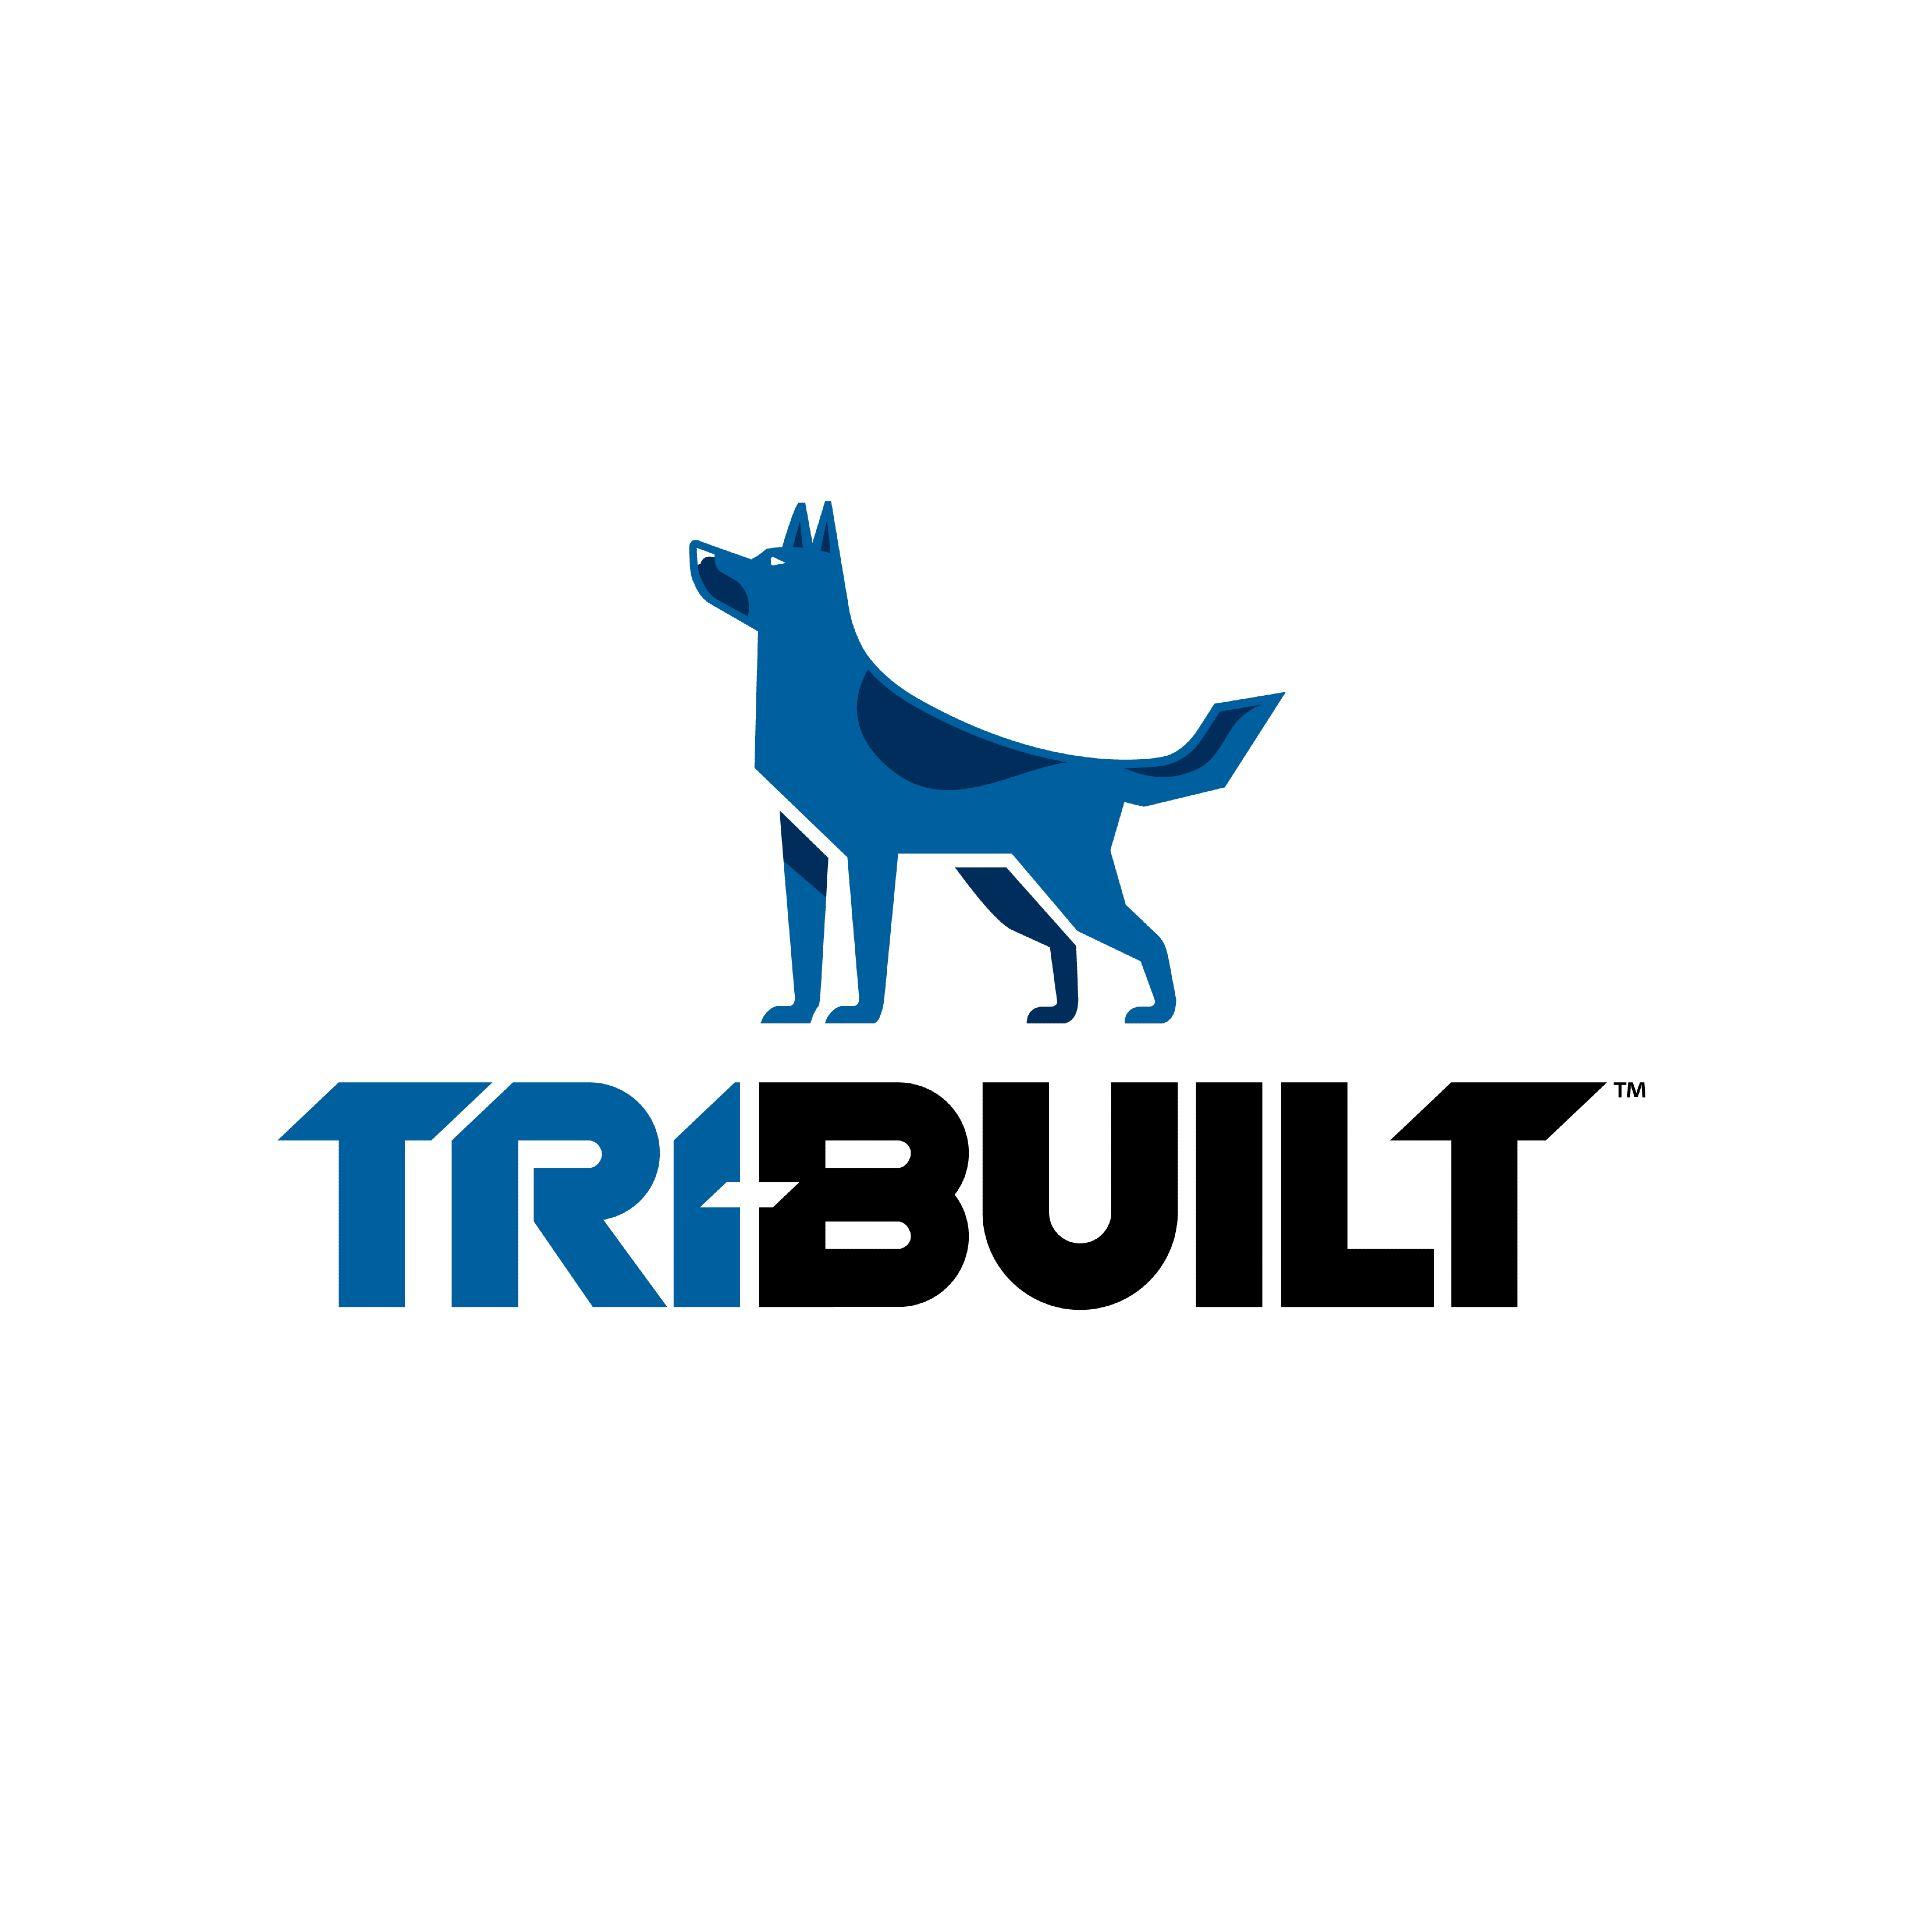 TRI-BUILT 255 1/4 Gallon Smooth Rod Revolving Frame Caulk Gun